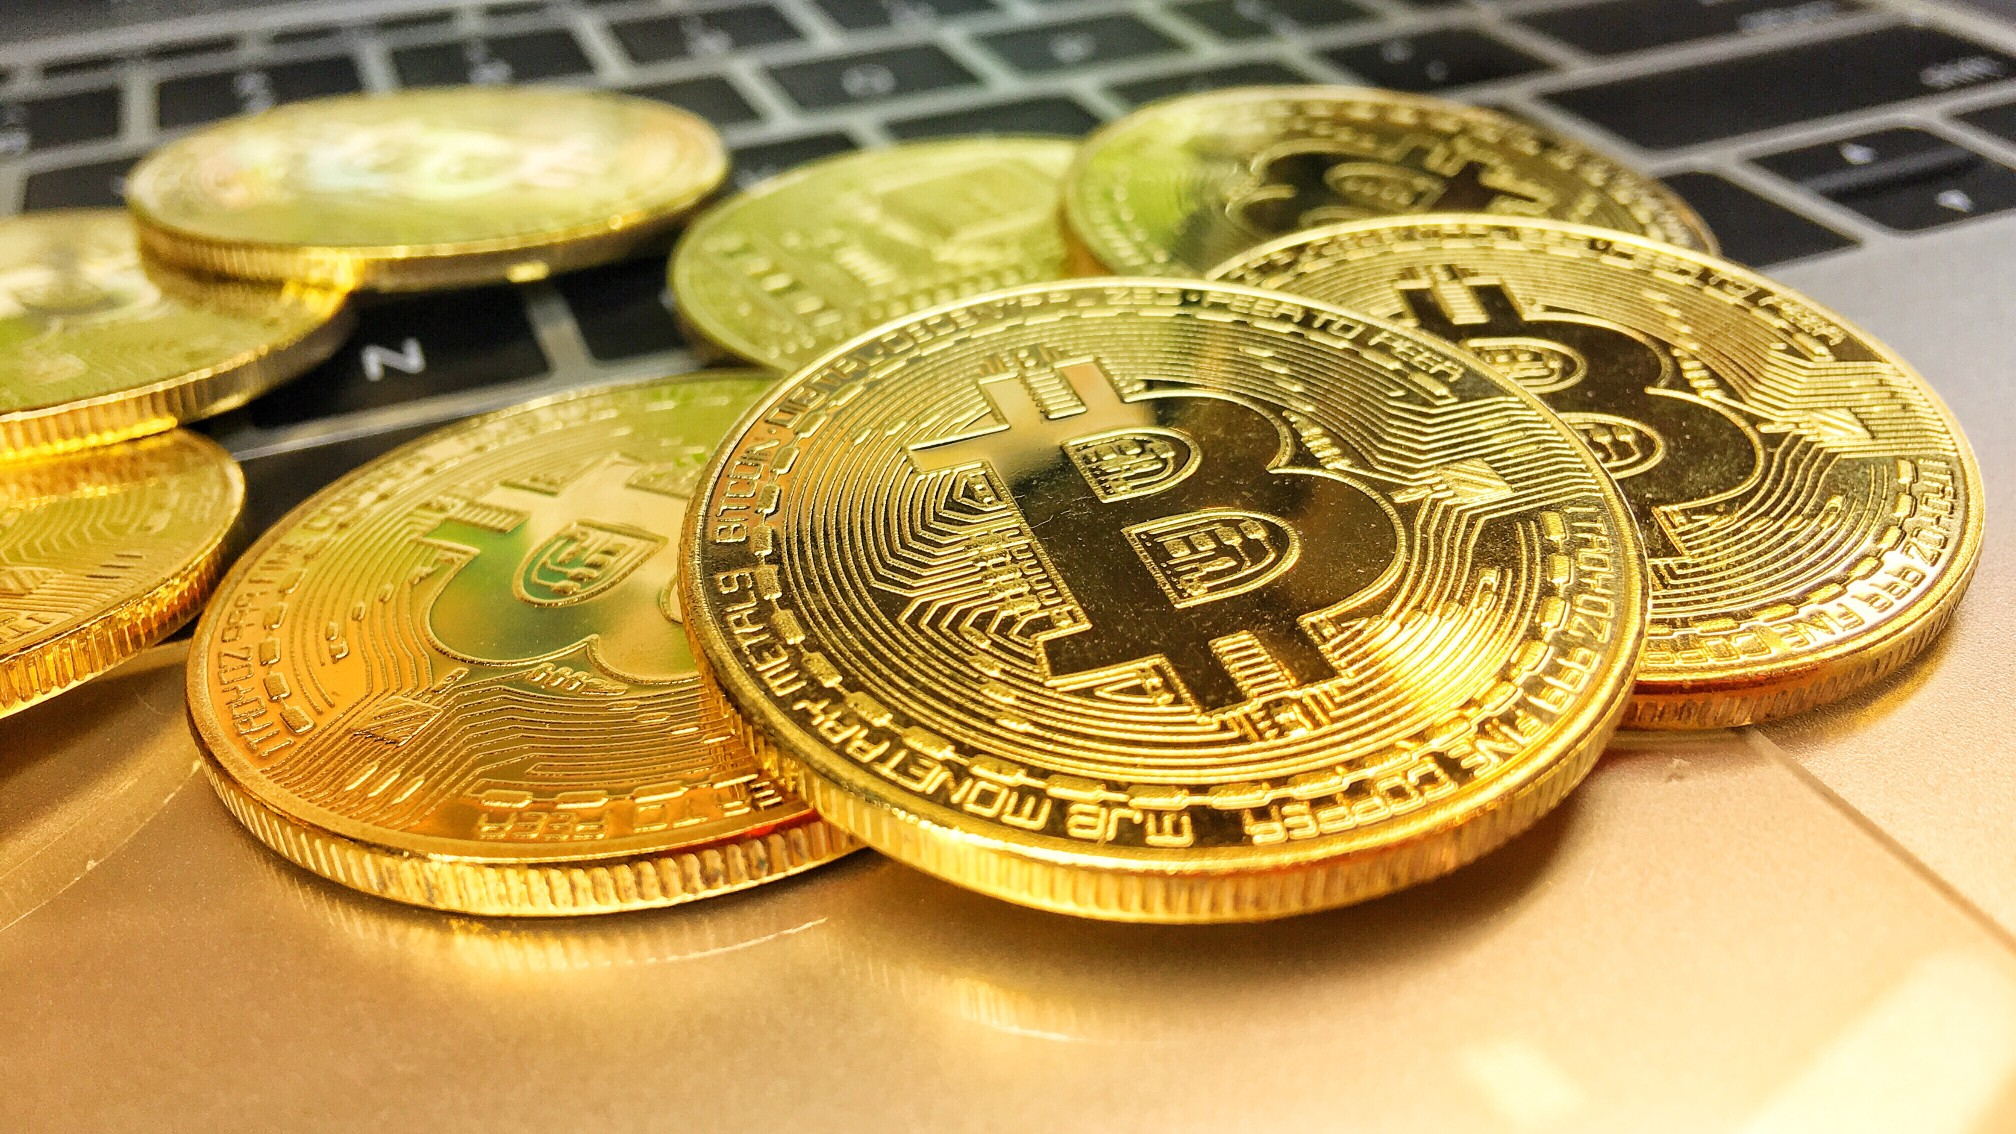 close up on gold bitcoin cryptocurrency blockchain bitcoin mining coins bitcoin business bitcoin logo t20 XzrRBb 1